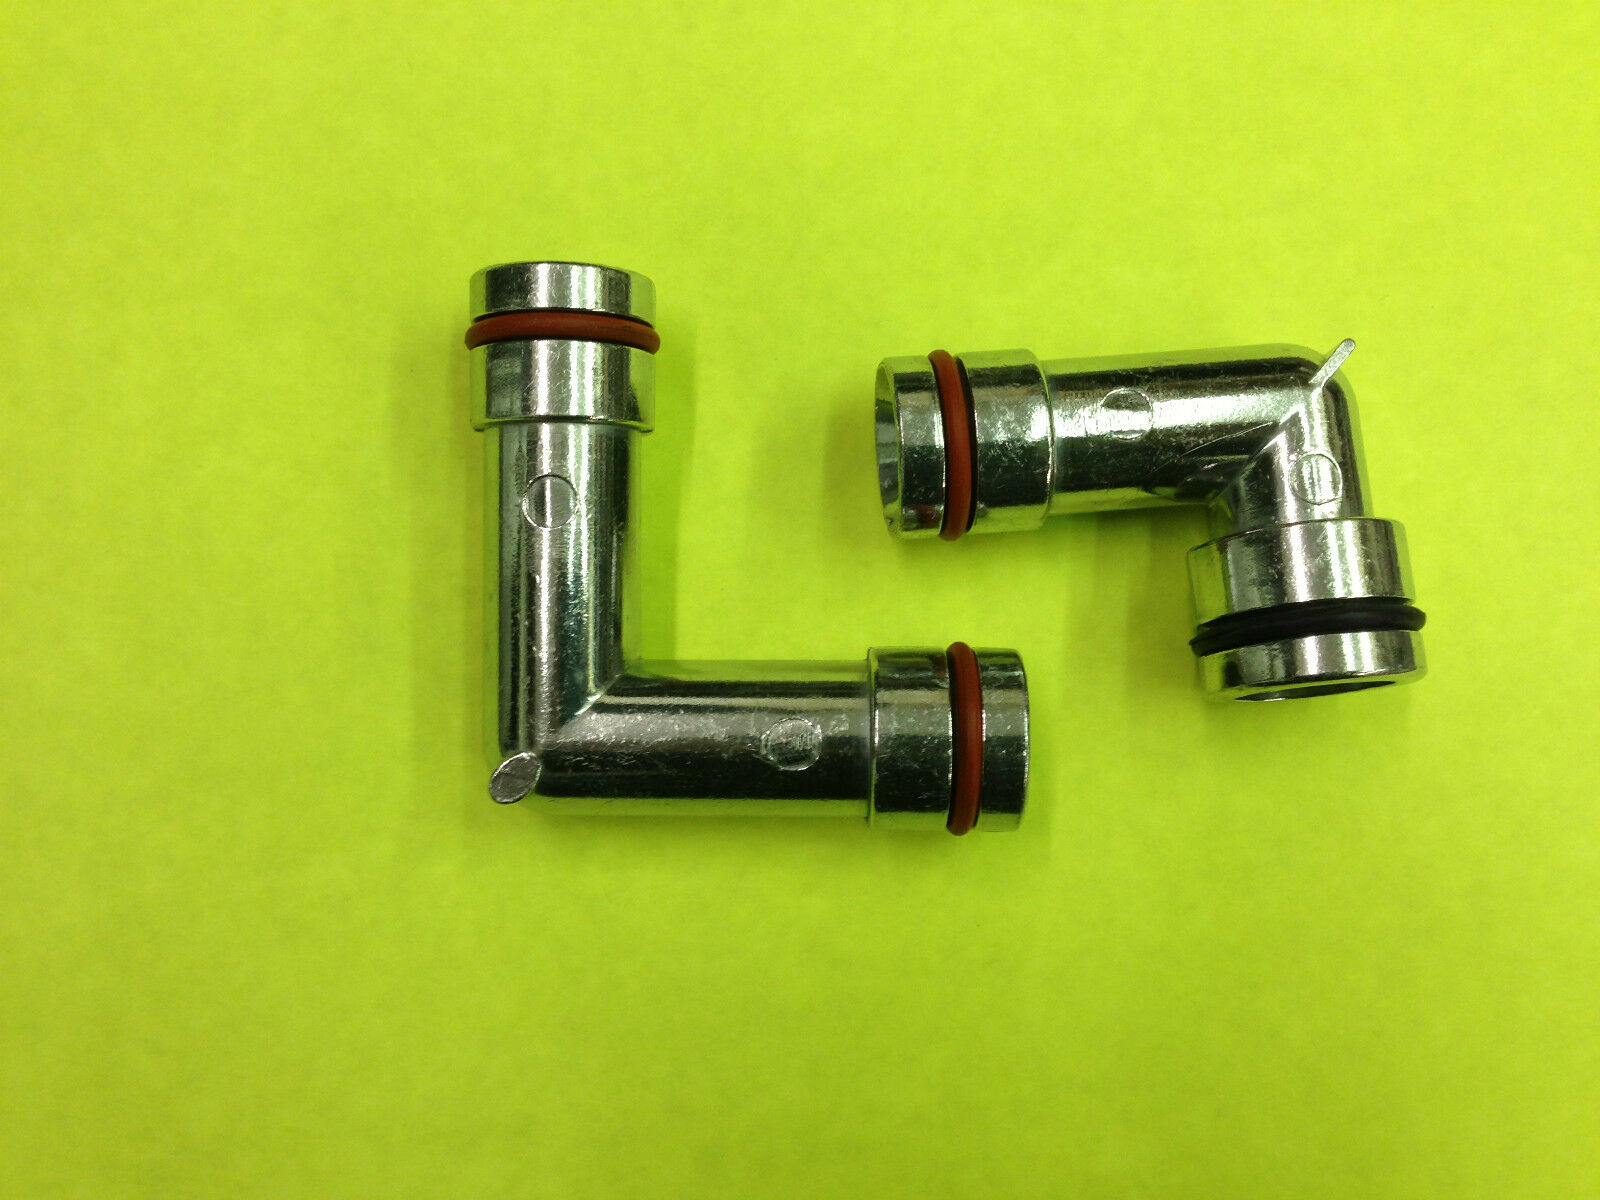 Ecklers Premier Quality Products 25-187800 Corvette Heater Hose Elbow